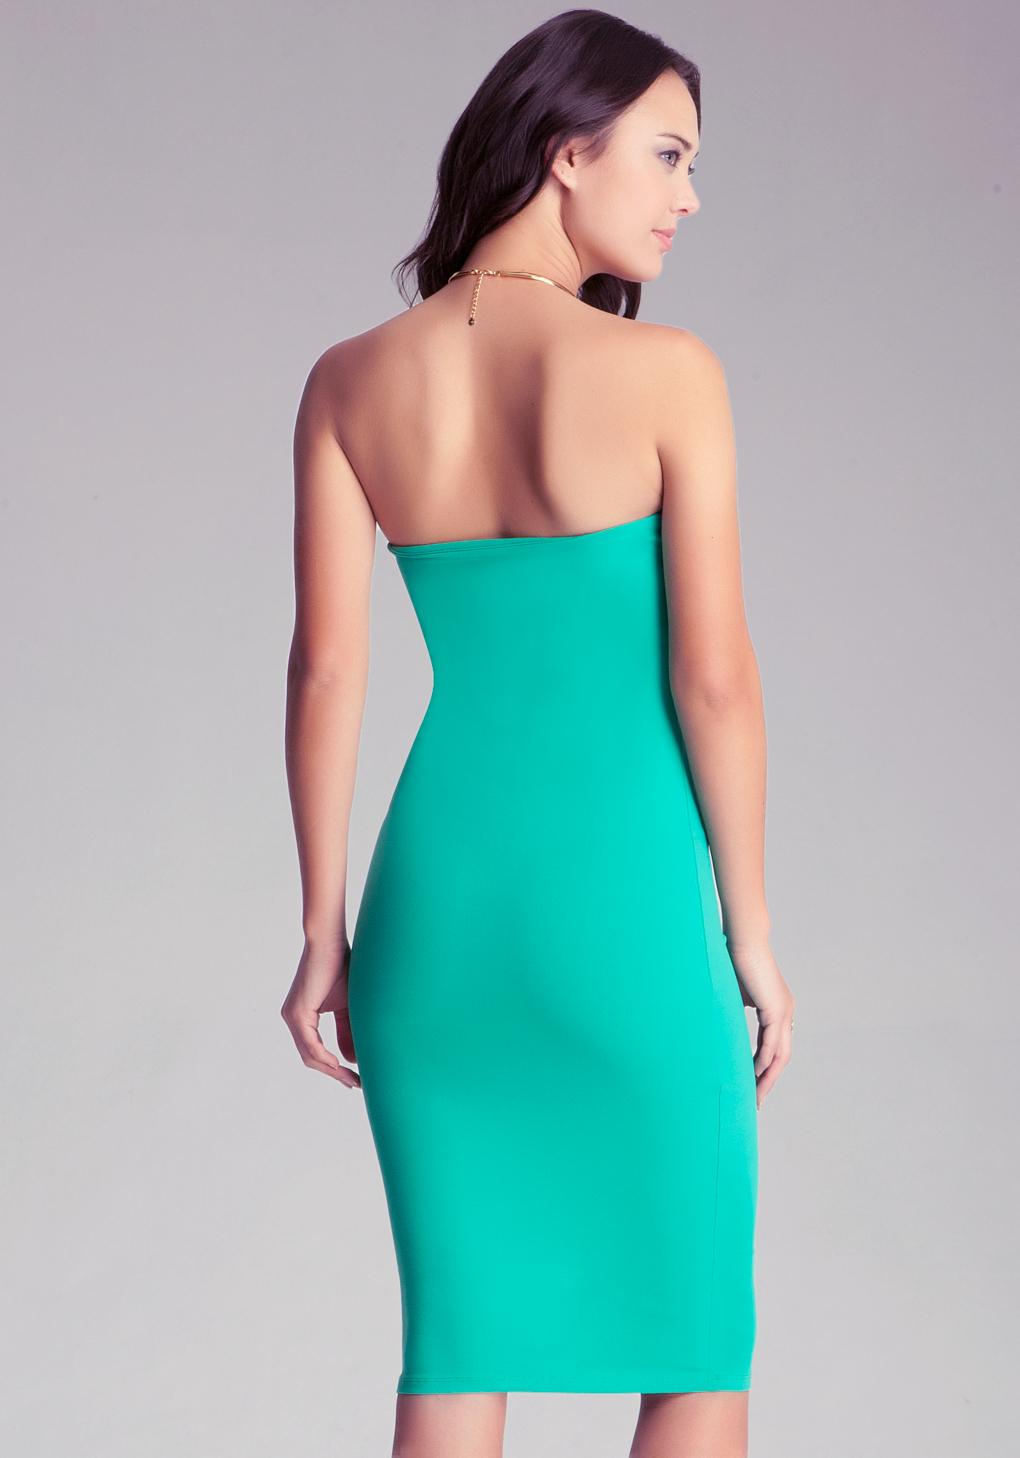 Lyst - Bebe Strapless Solid Midi Dress in Green